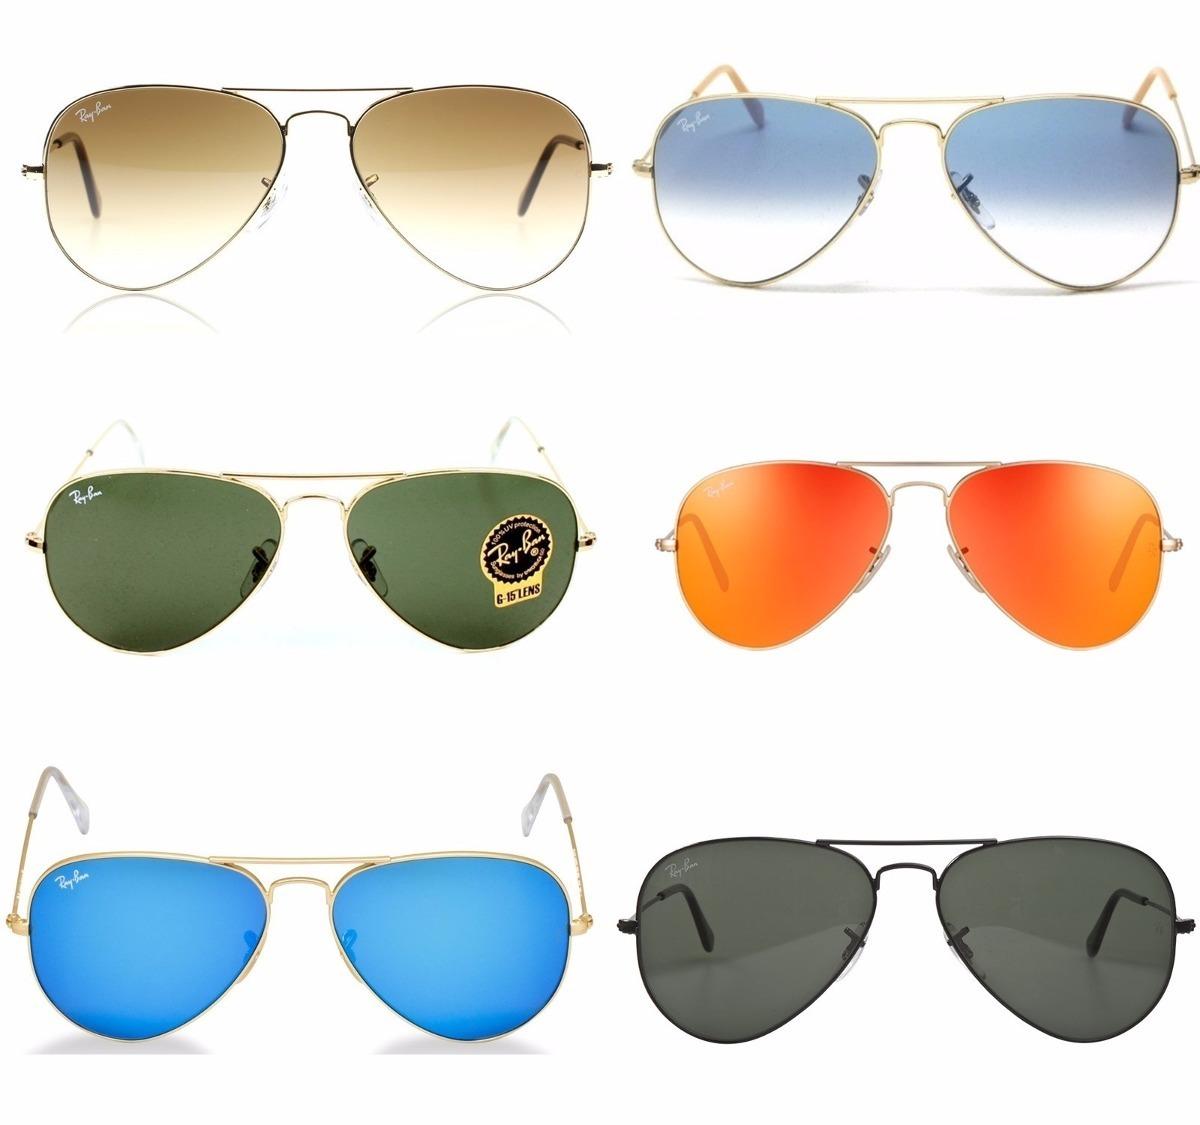 76915460b7249 óculos ray-ban rb3025 aviador original masculino feminino. Carregando zoom.